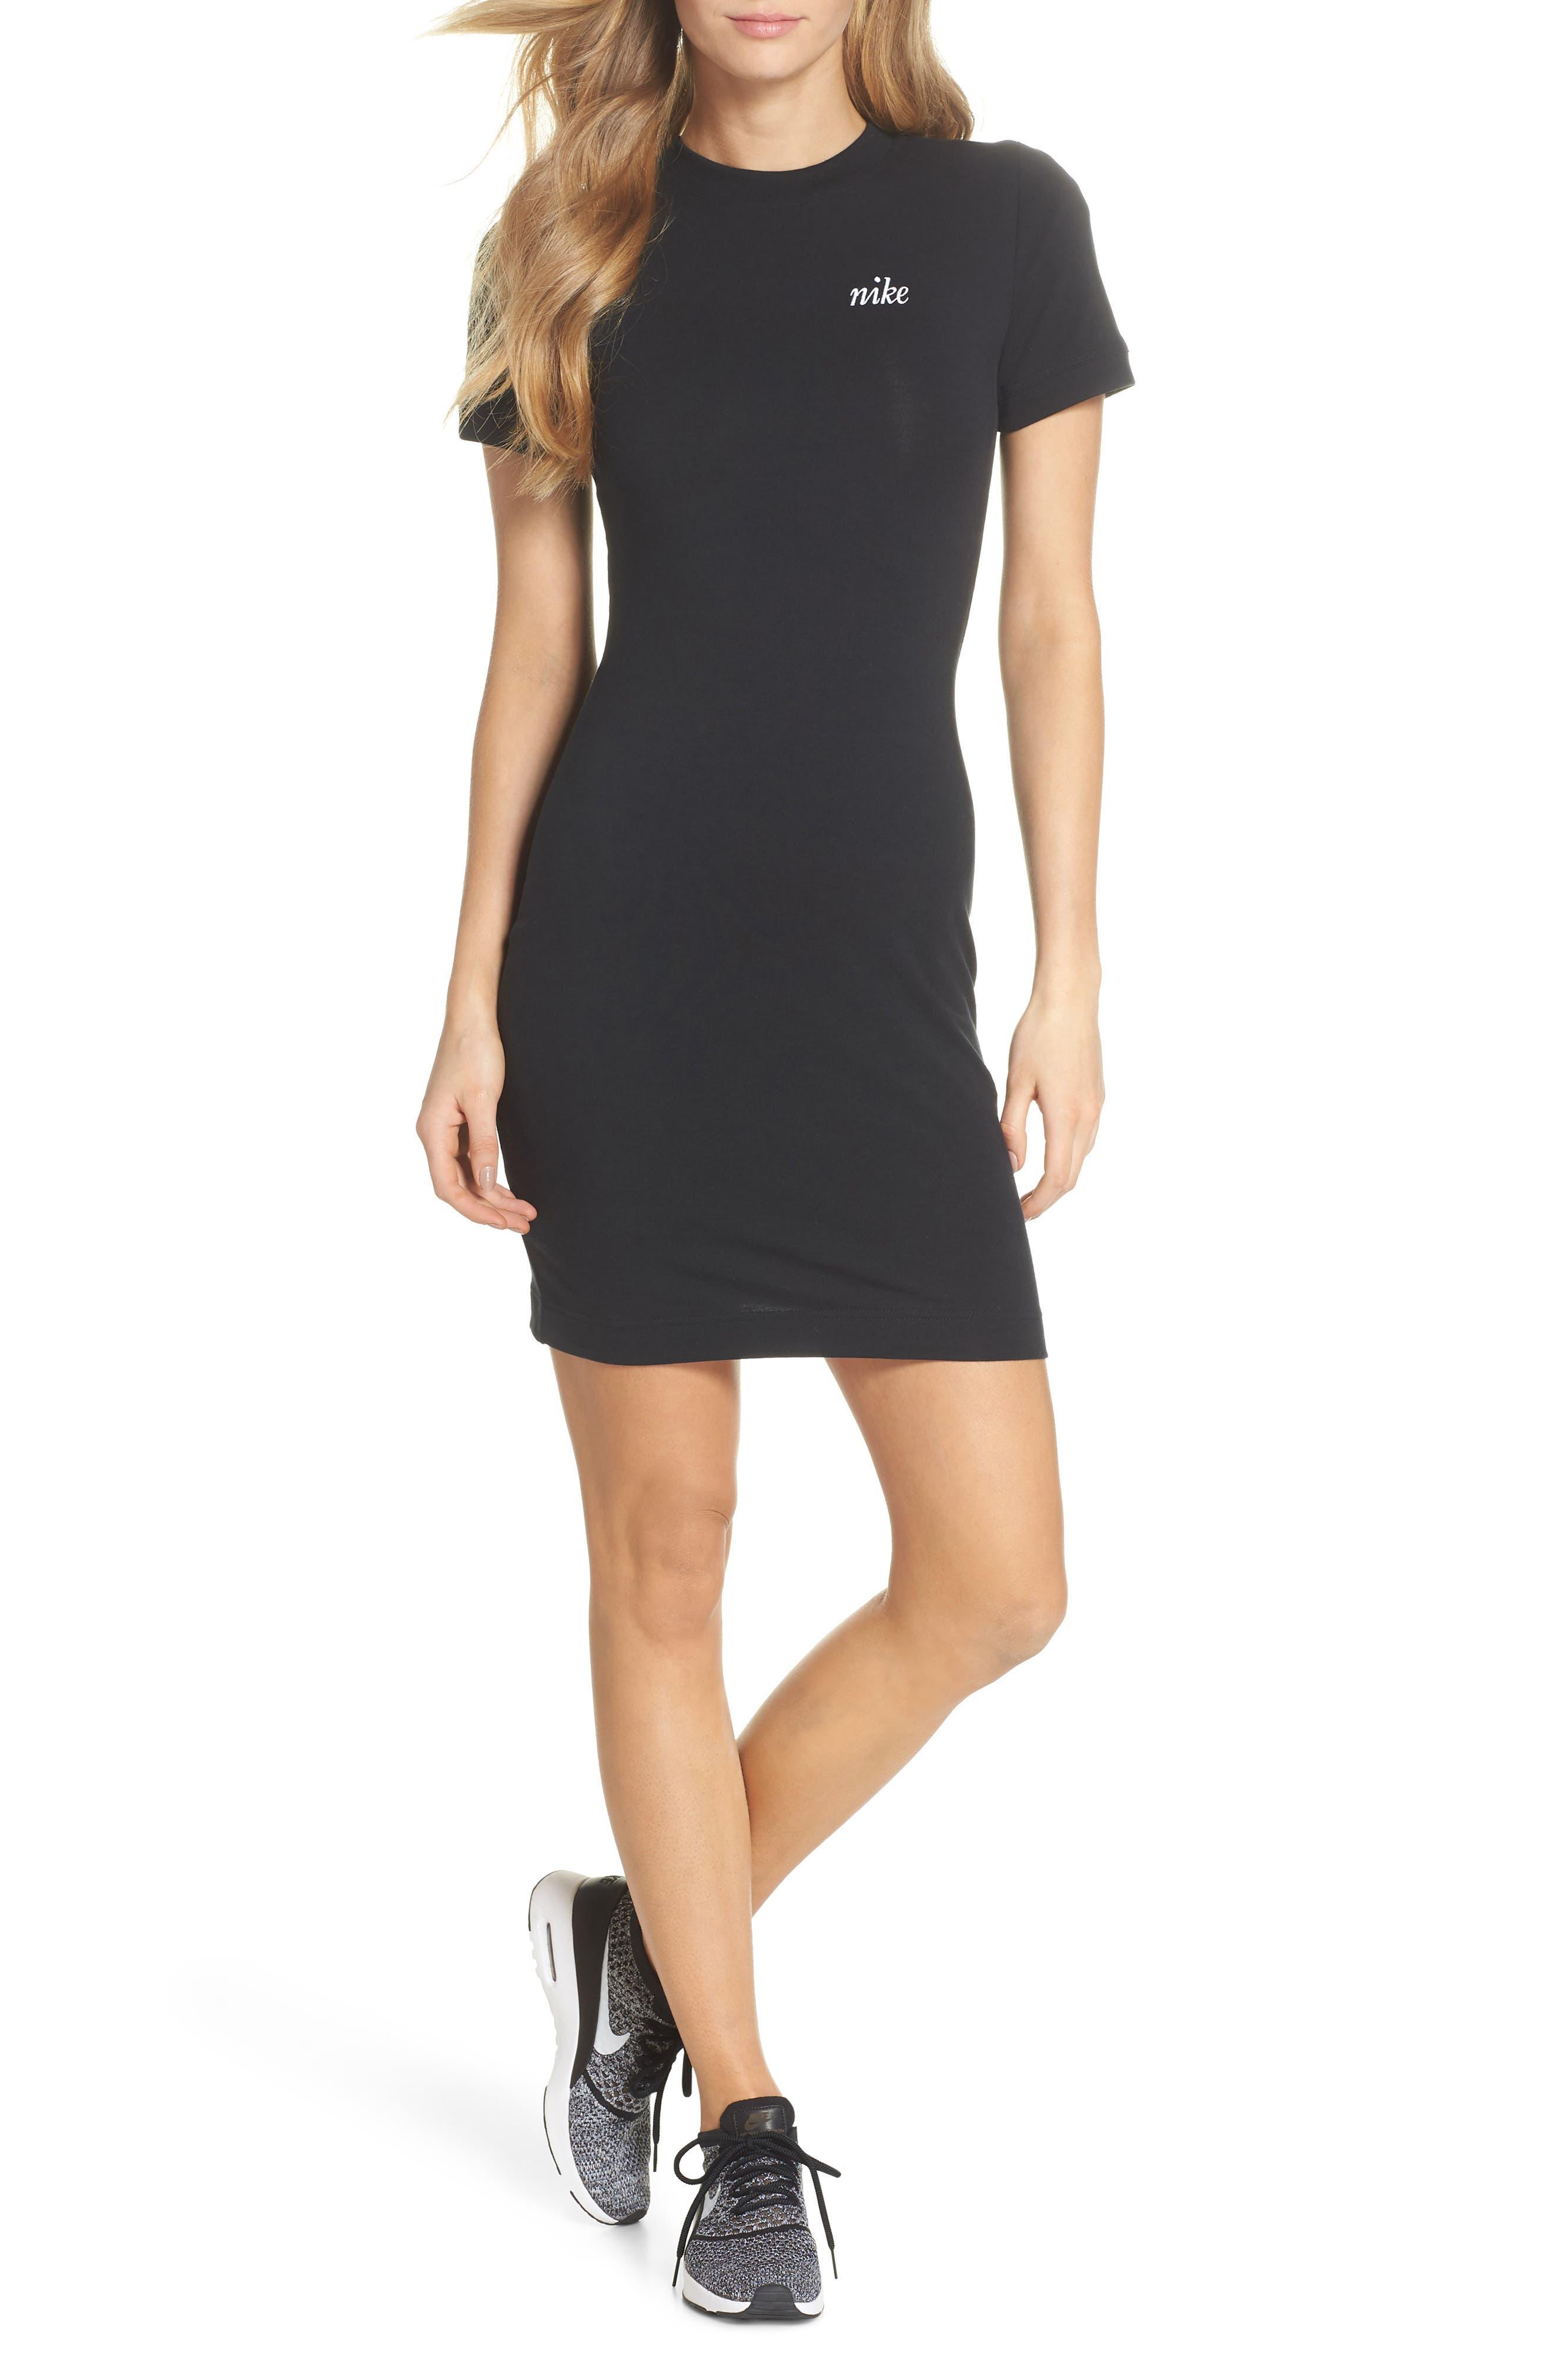 Sportswear T-Shirt Dress,                             Main thumbnail 1, color,                             Black/ White